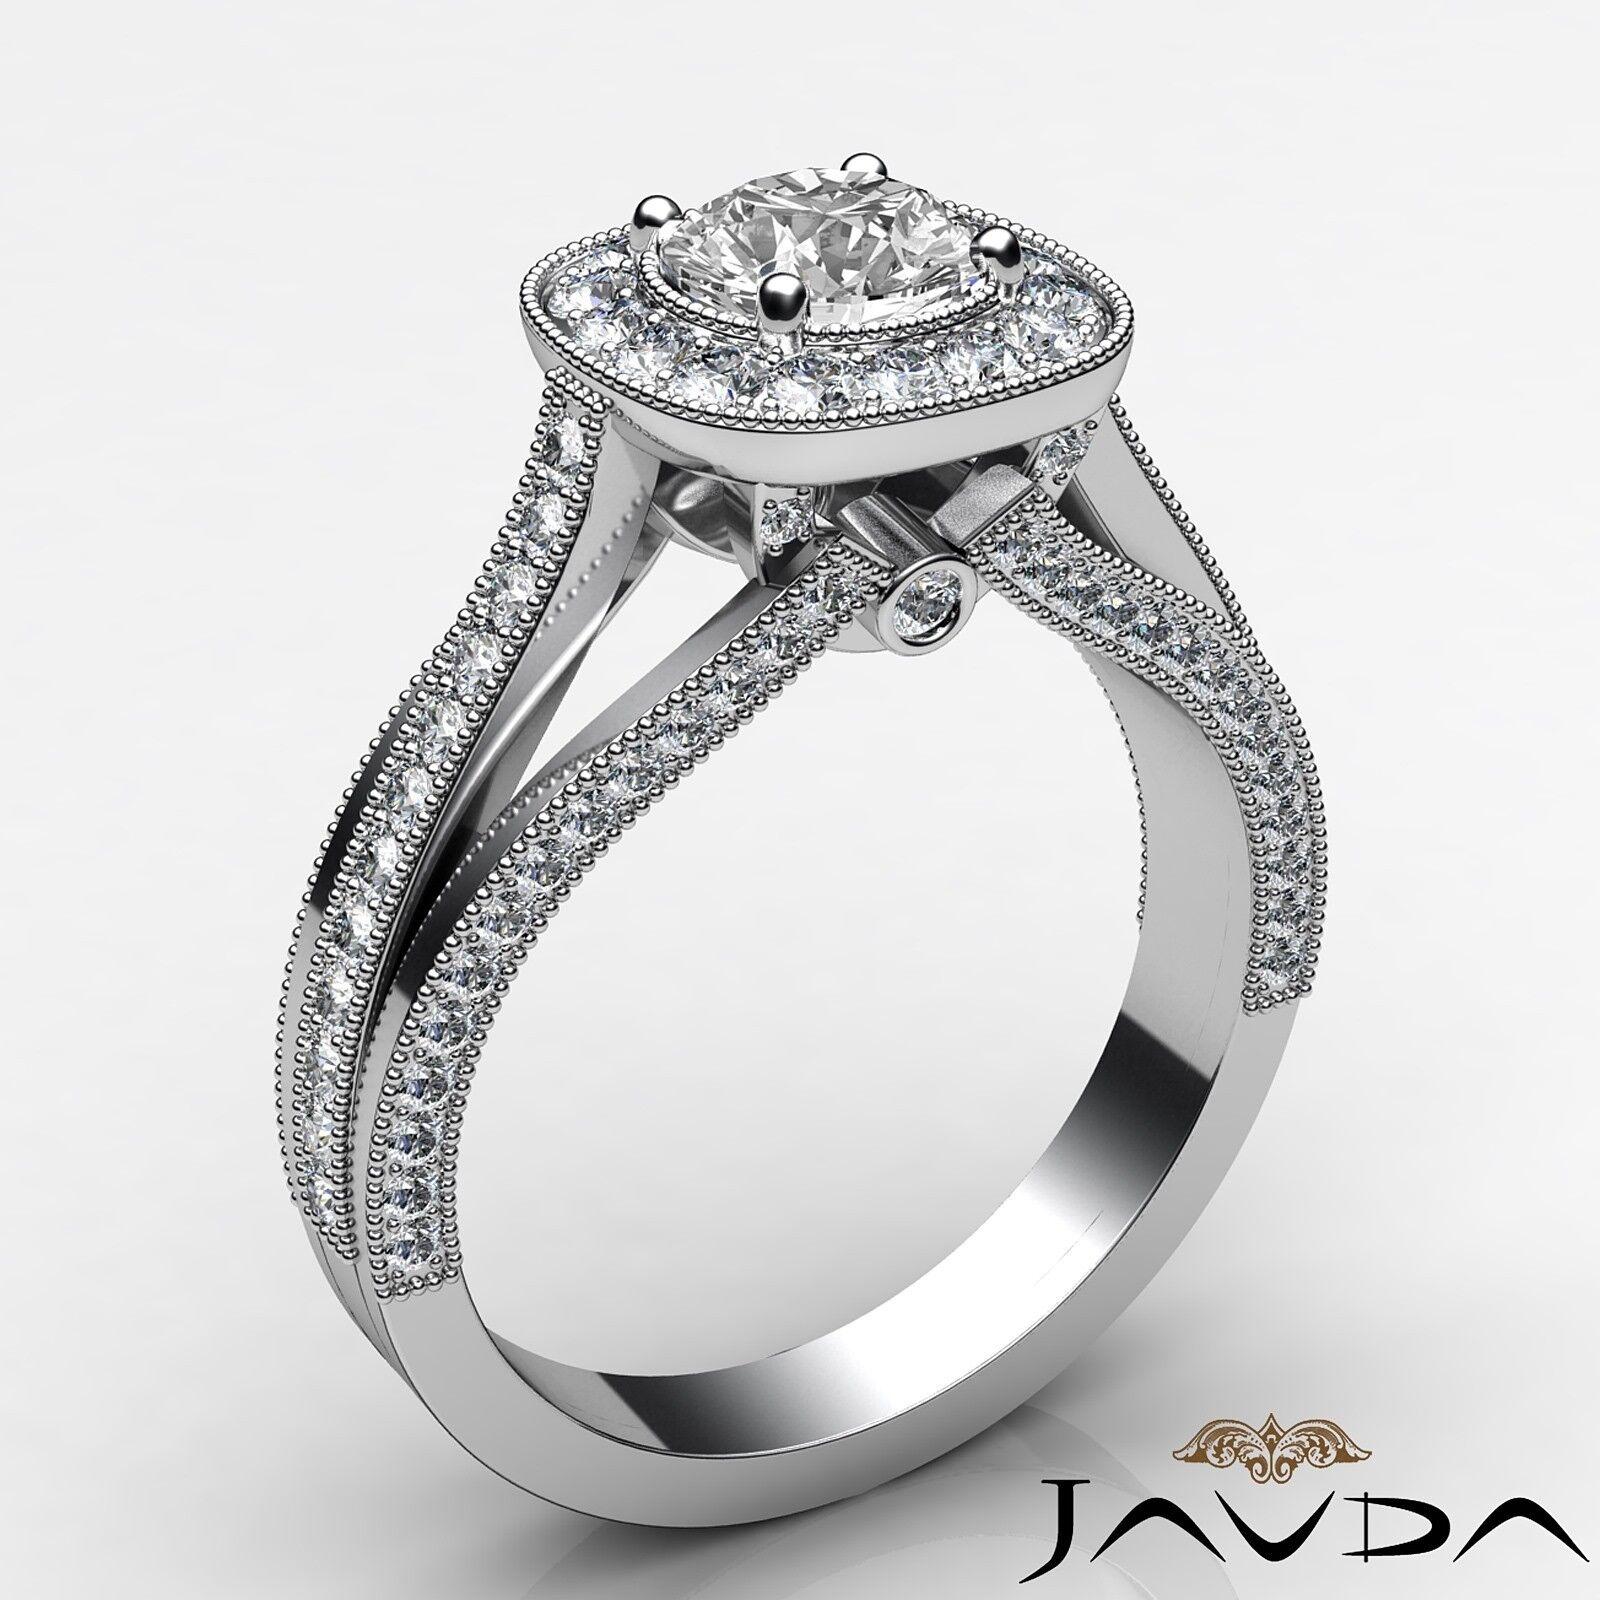 1.6ctw Bridge Accent Round Diamond Engagement Ring GIA E-VVS2 White Gold Rings 1